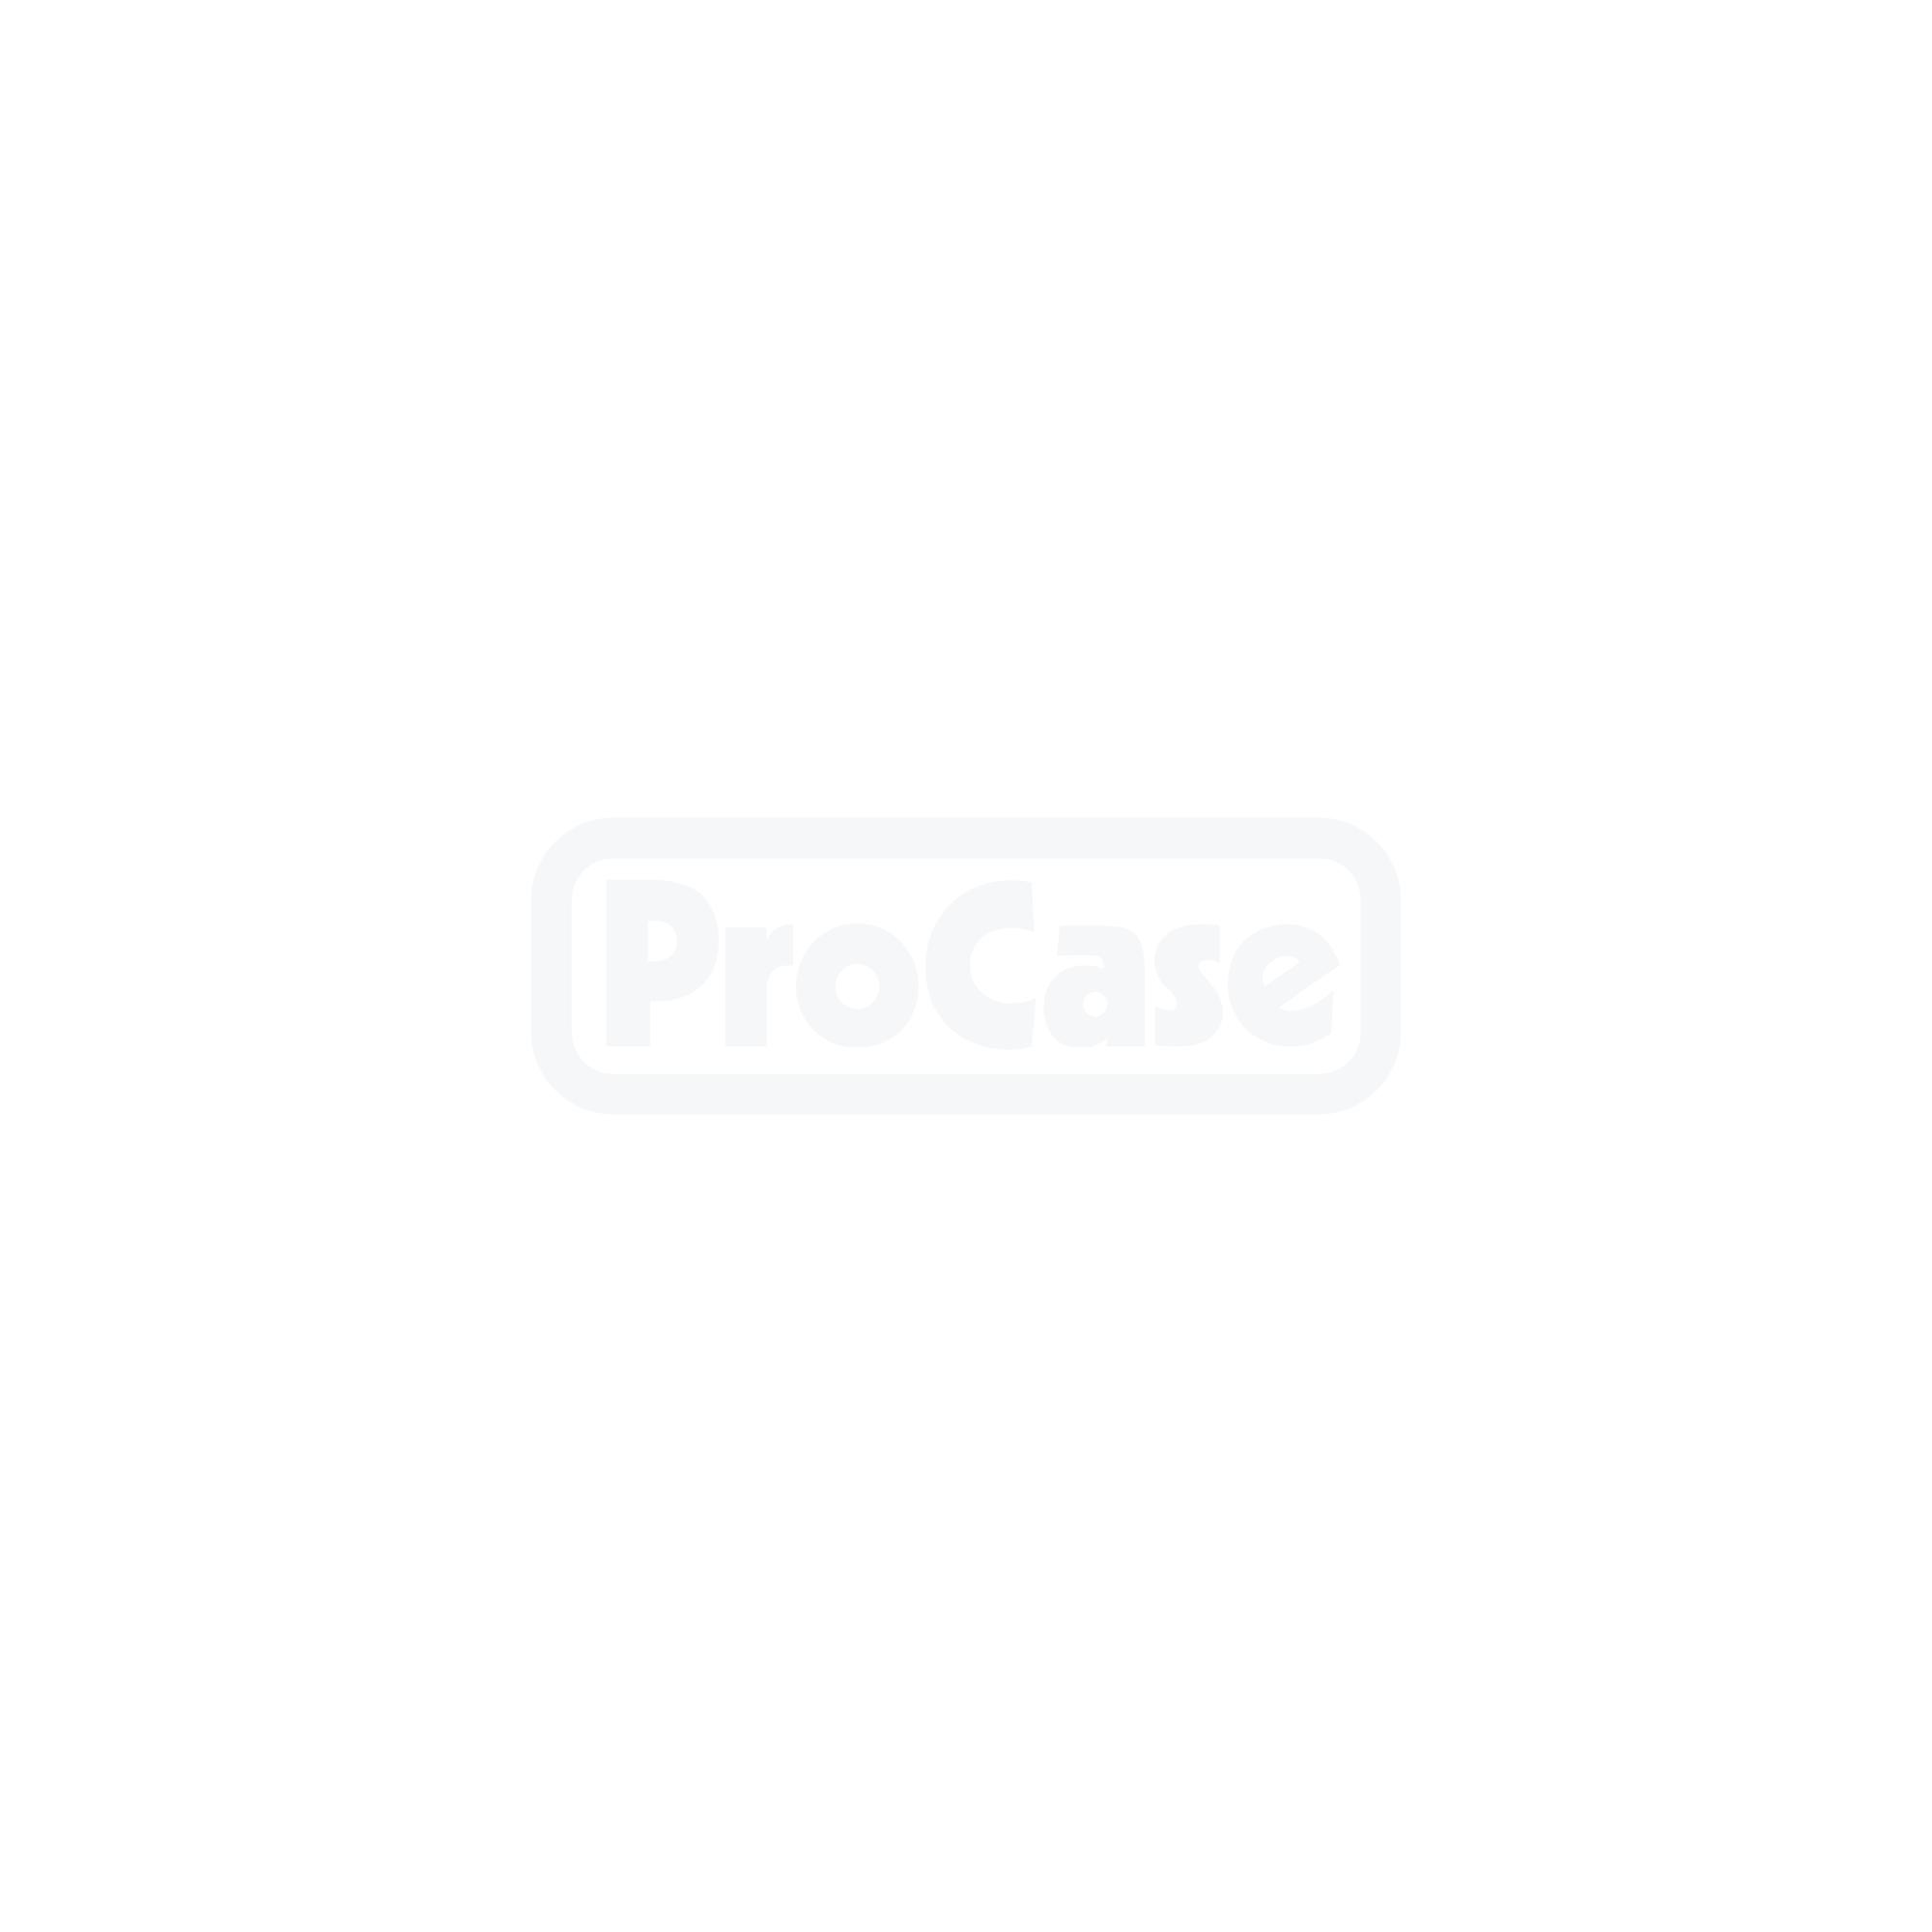 Flightcase für Tridelity MV6500 Display 3